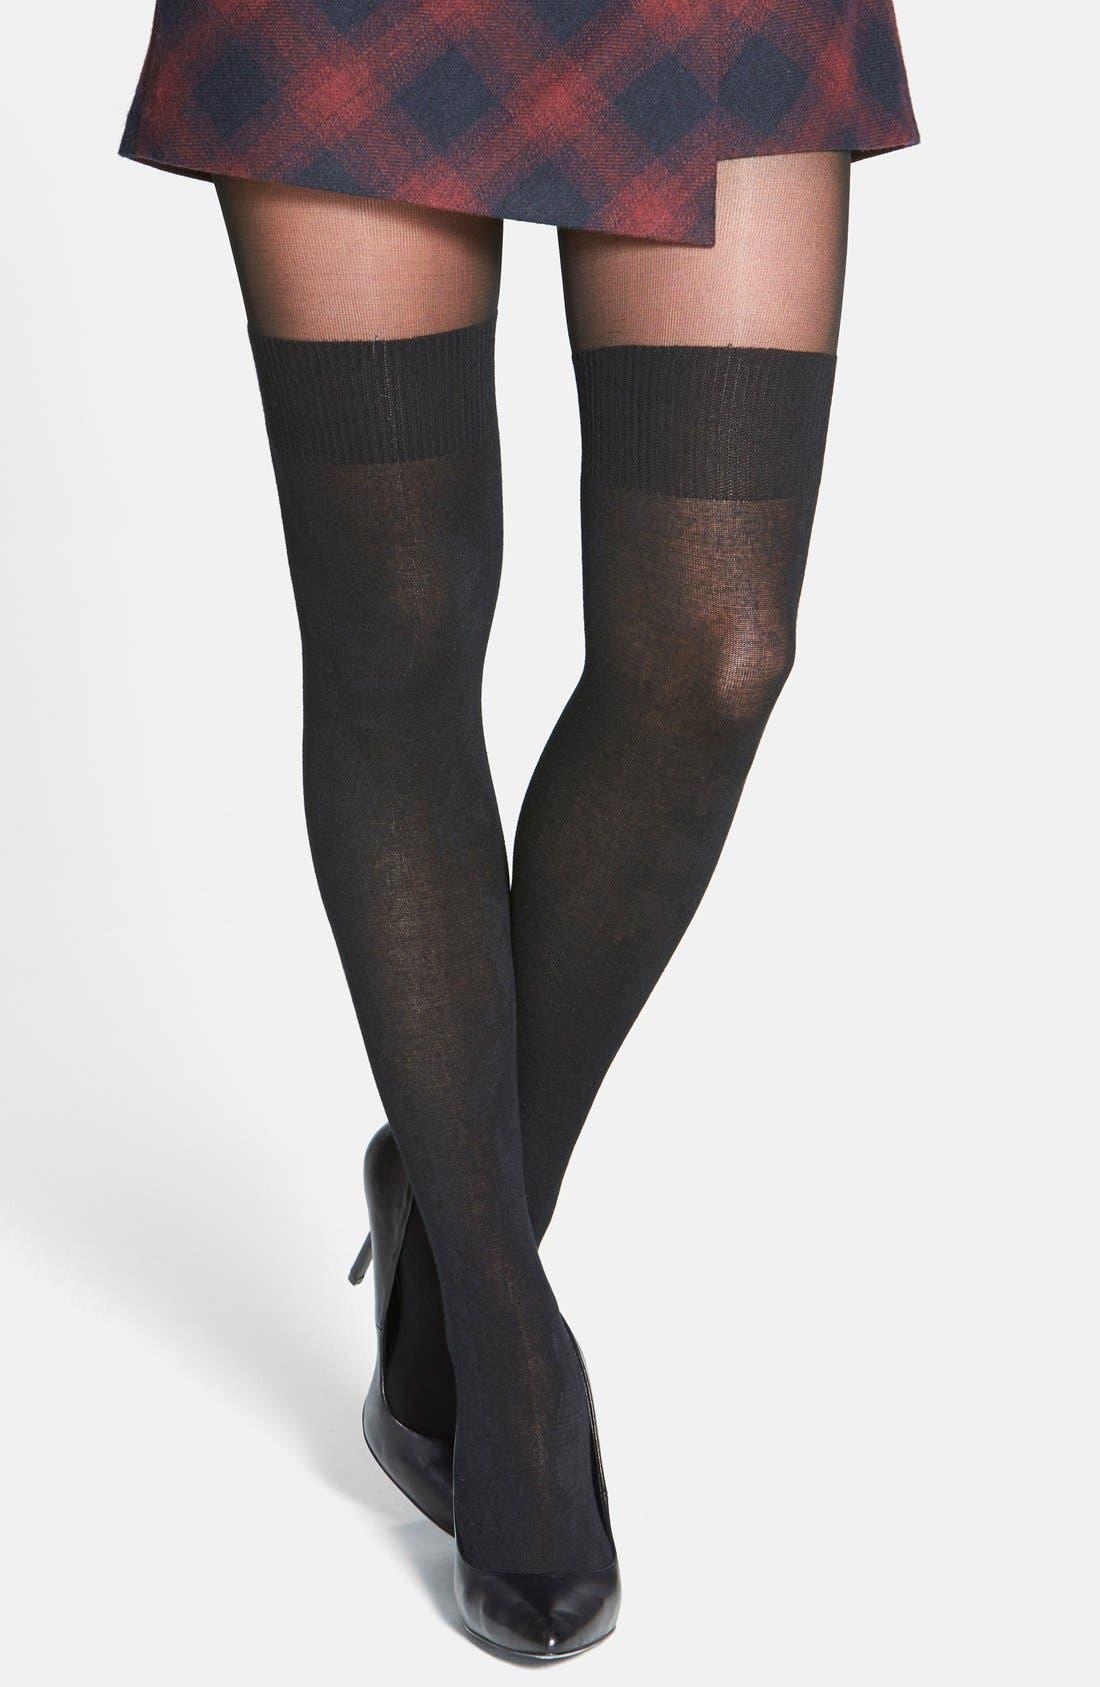 Alternate Image 1 Selected - Pretty Polly 'Secret Socks' Tights